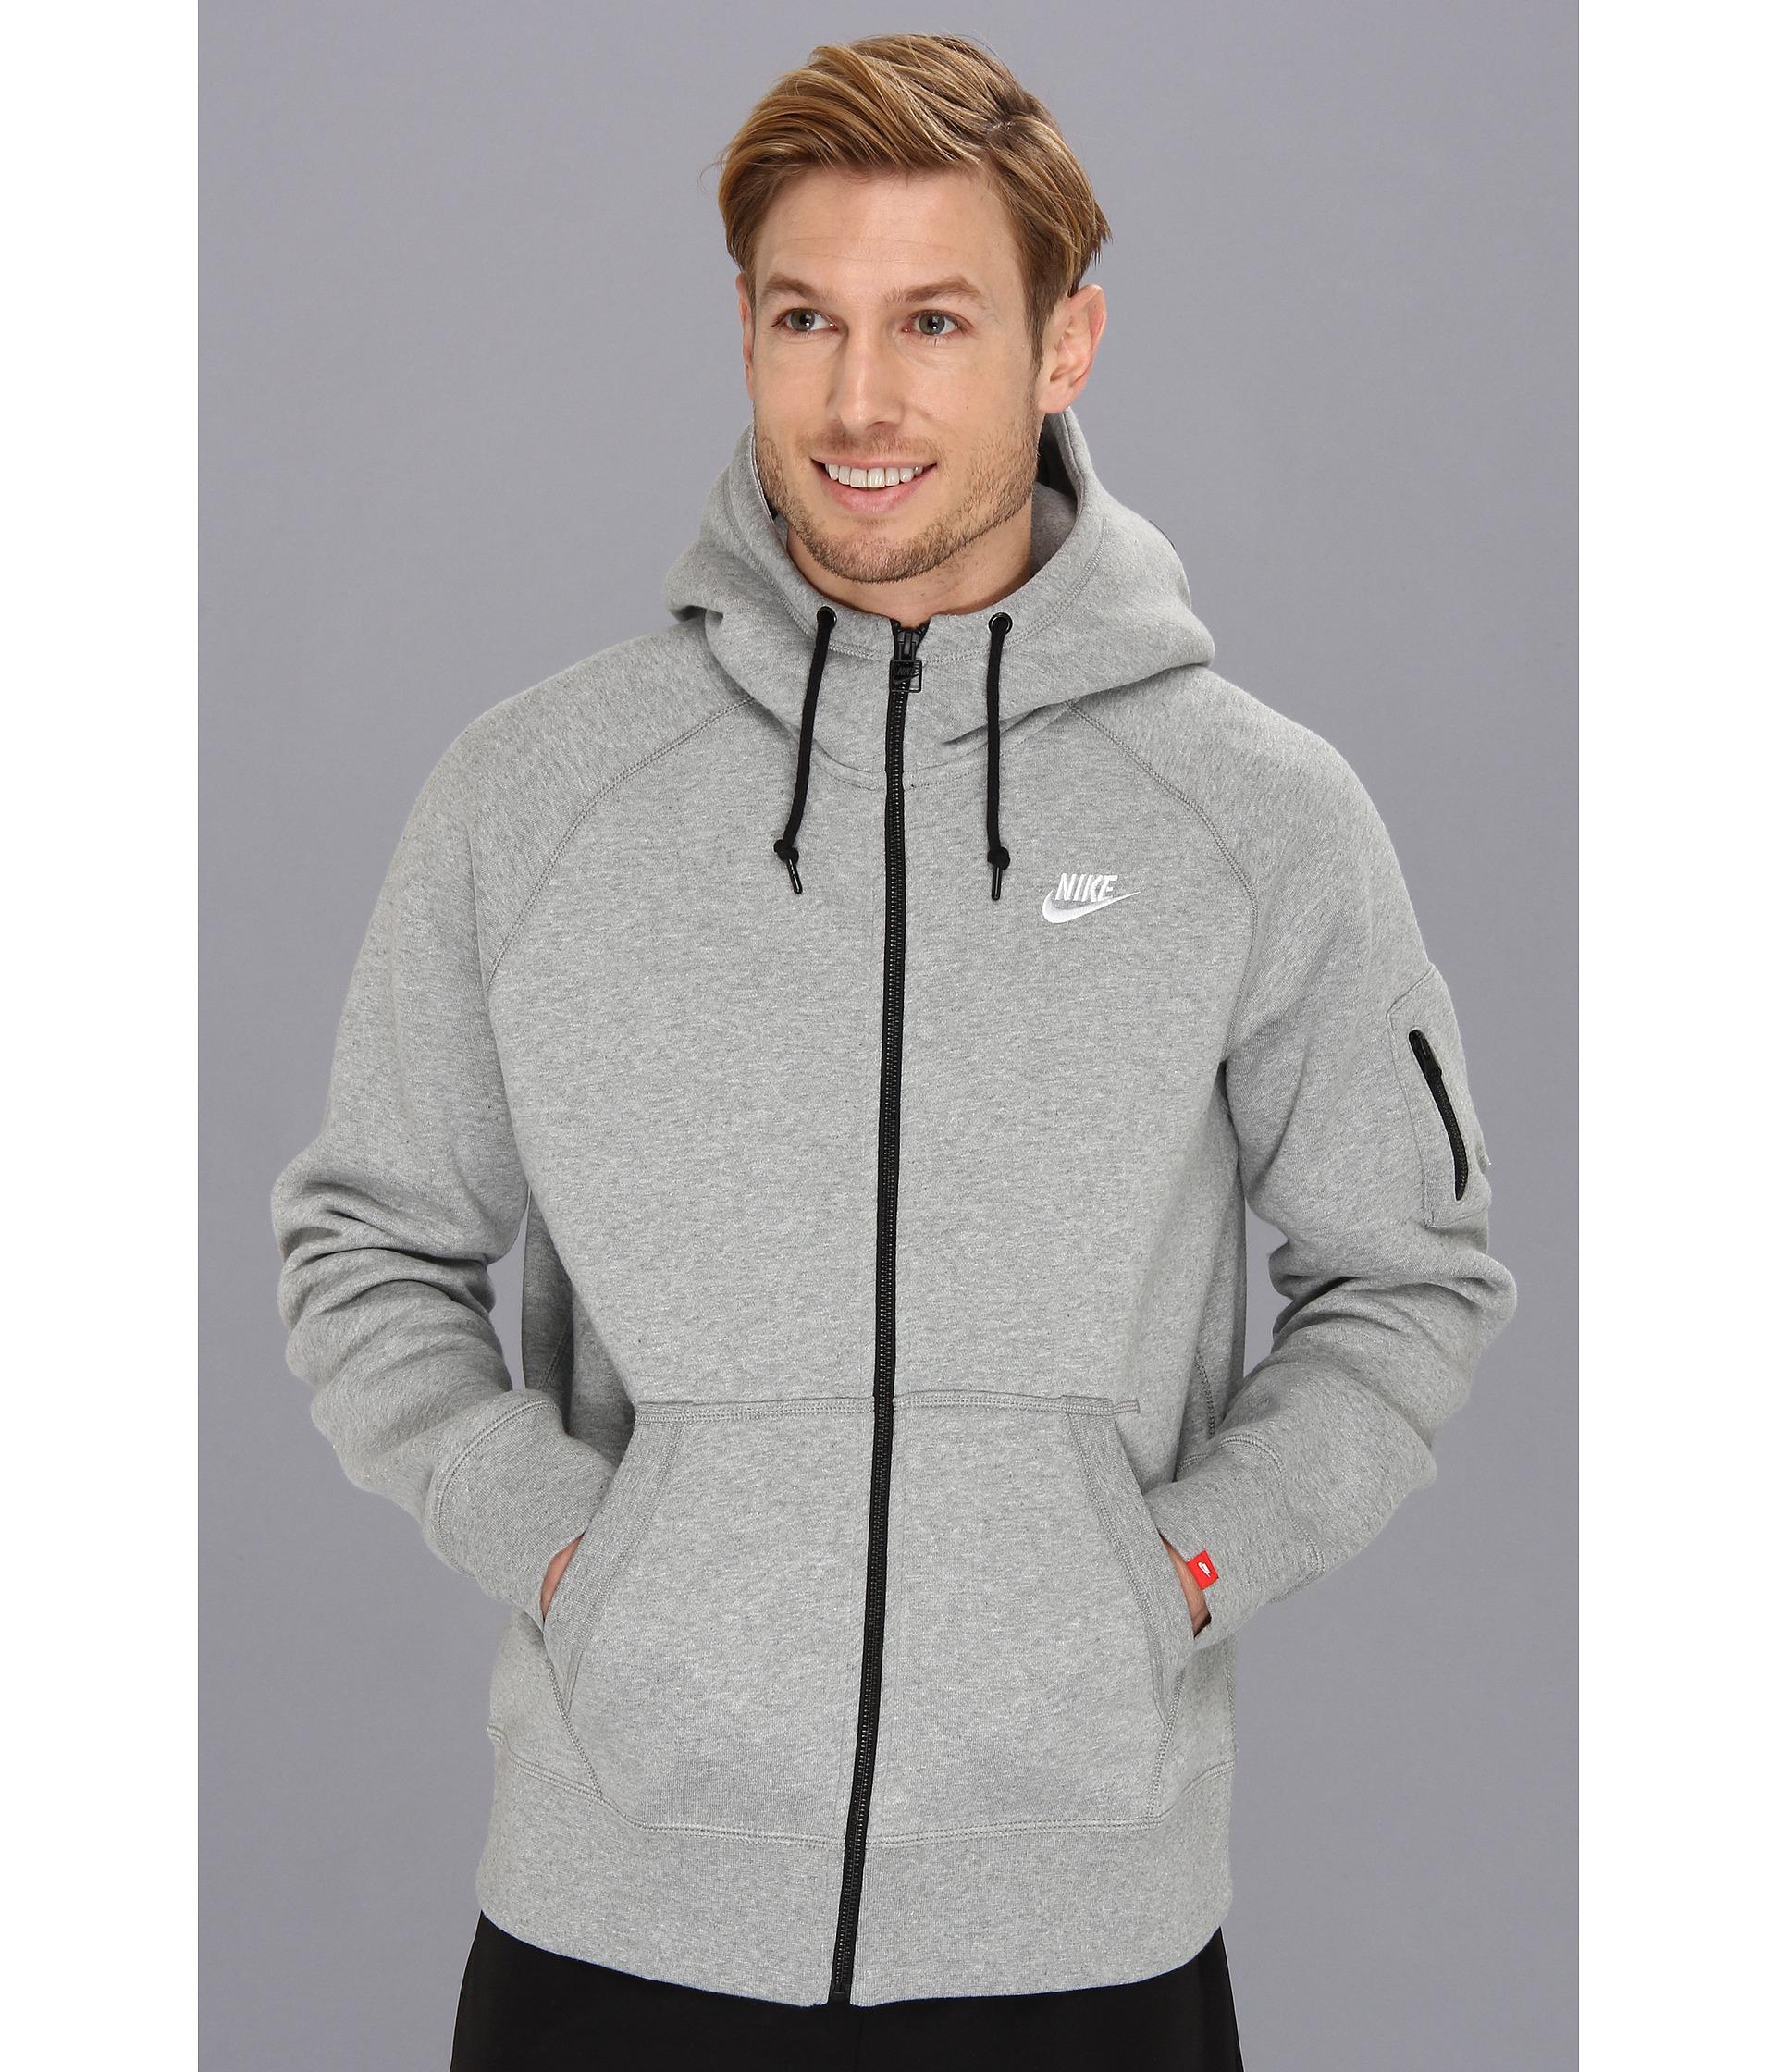 Fleece Hoodie Aw77 For Fz Nike Men Gray tBhCsoQrdx